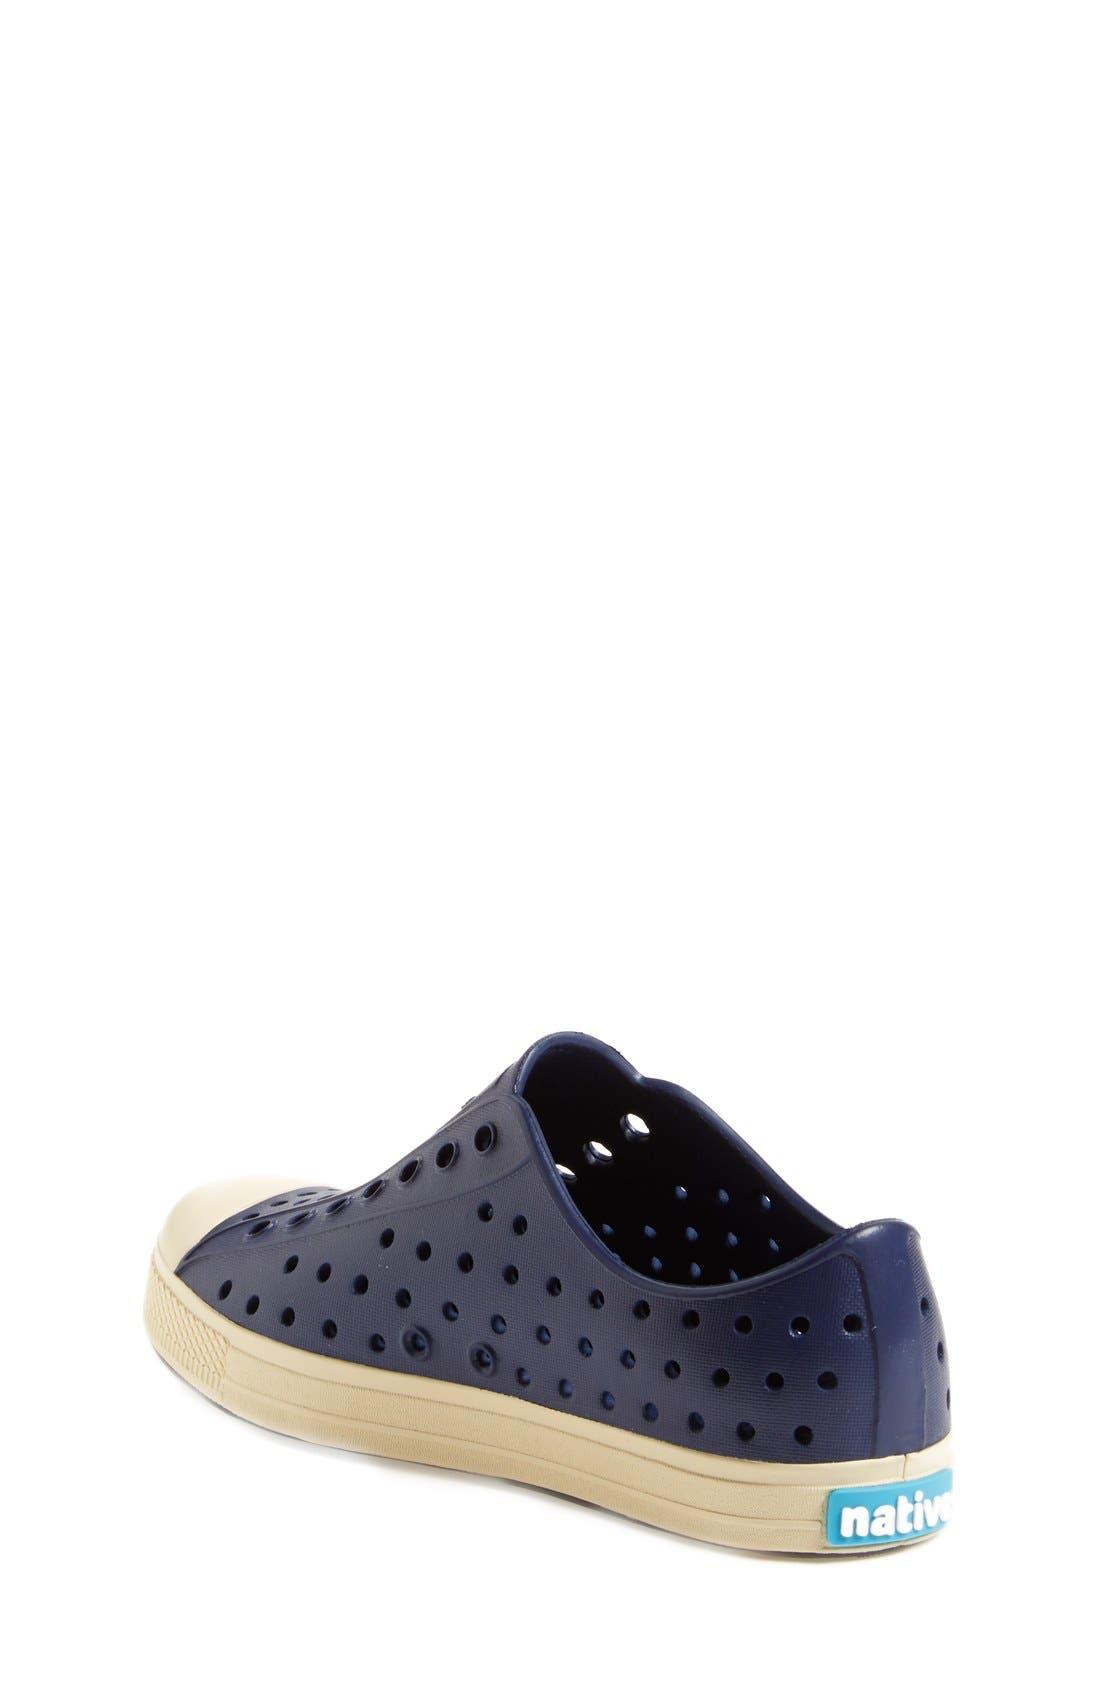 'Jefferson' Water Friendly Slip-On Sneaker,                             Alternate thumbnail 99, color,